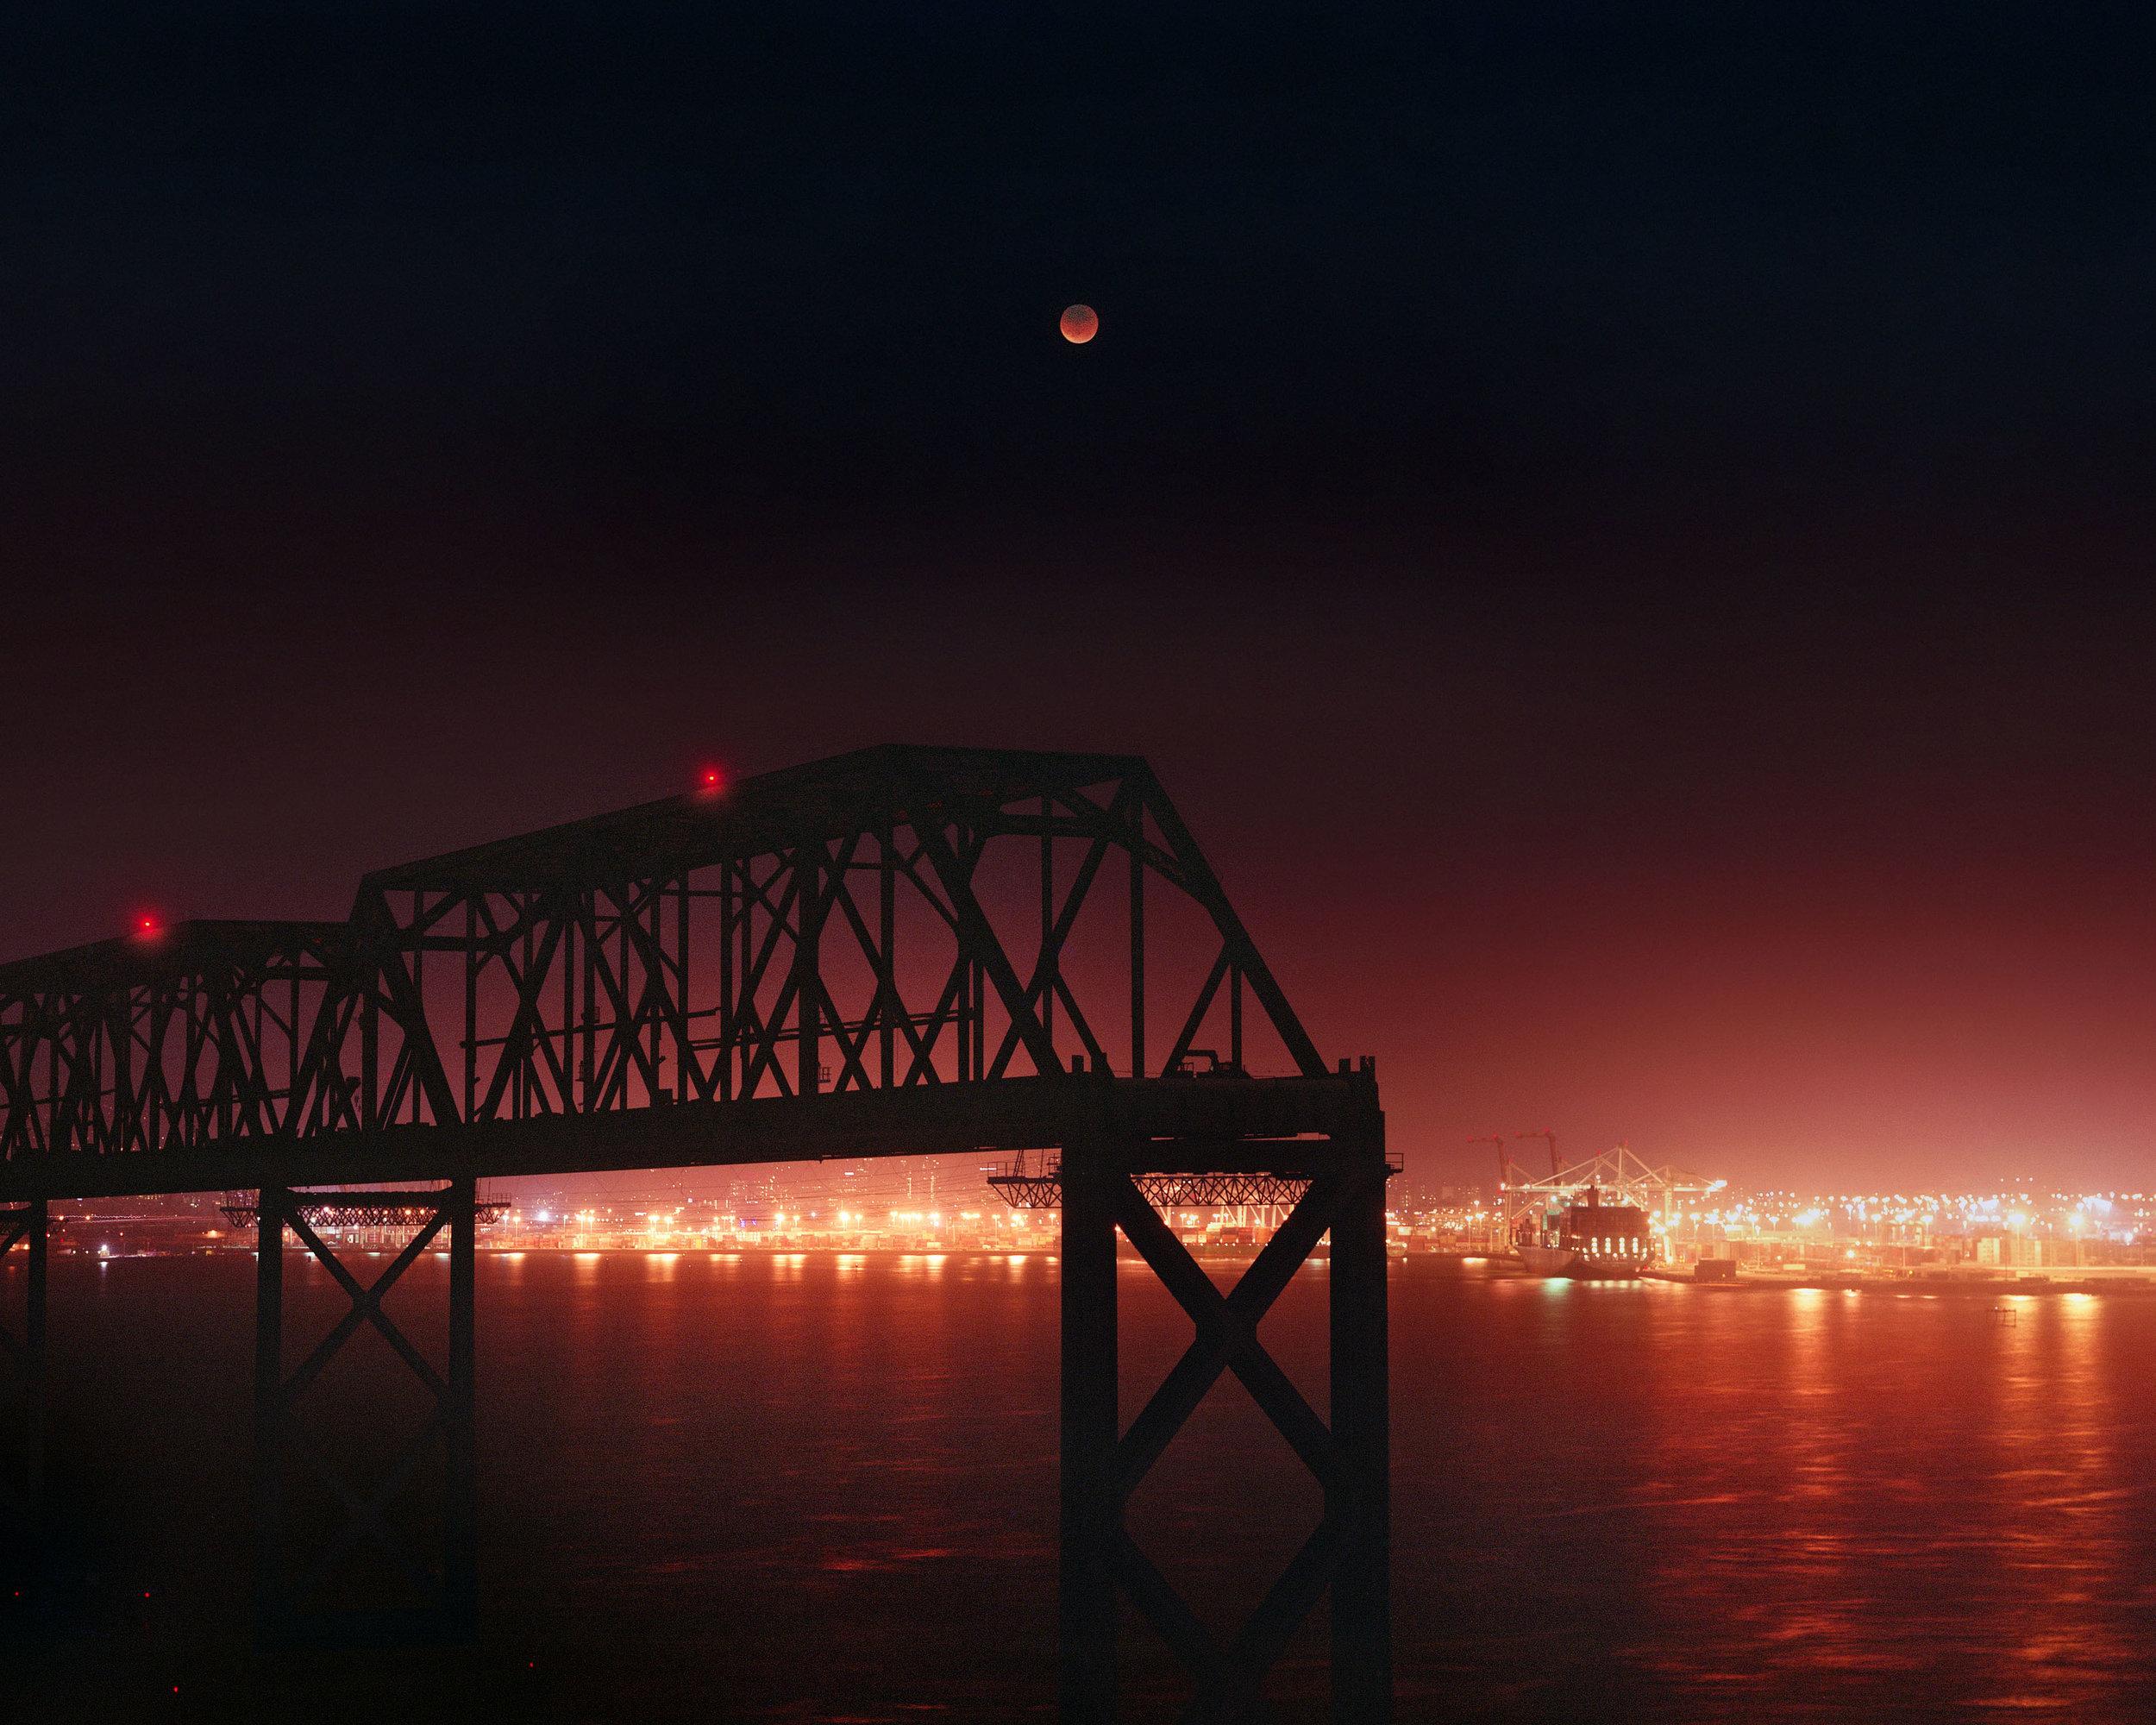 Lunar Eclipse, September 27, 2015